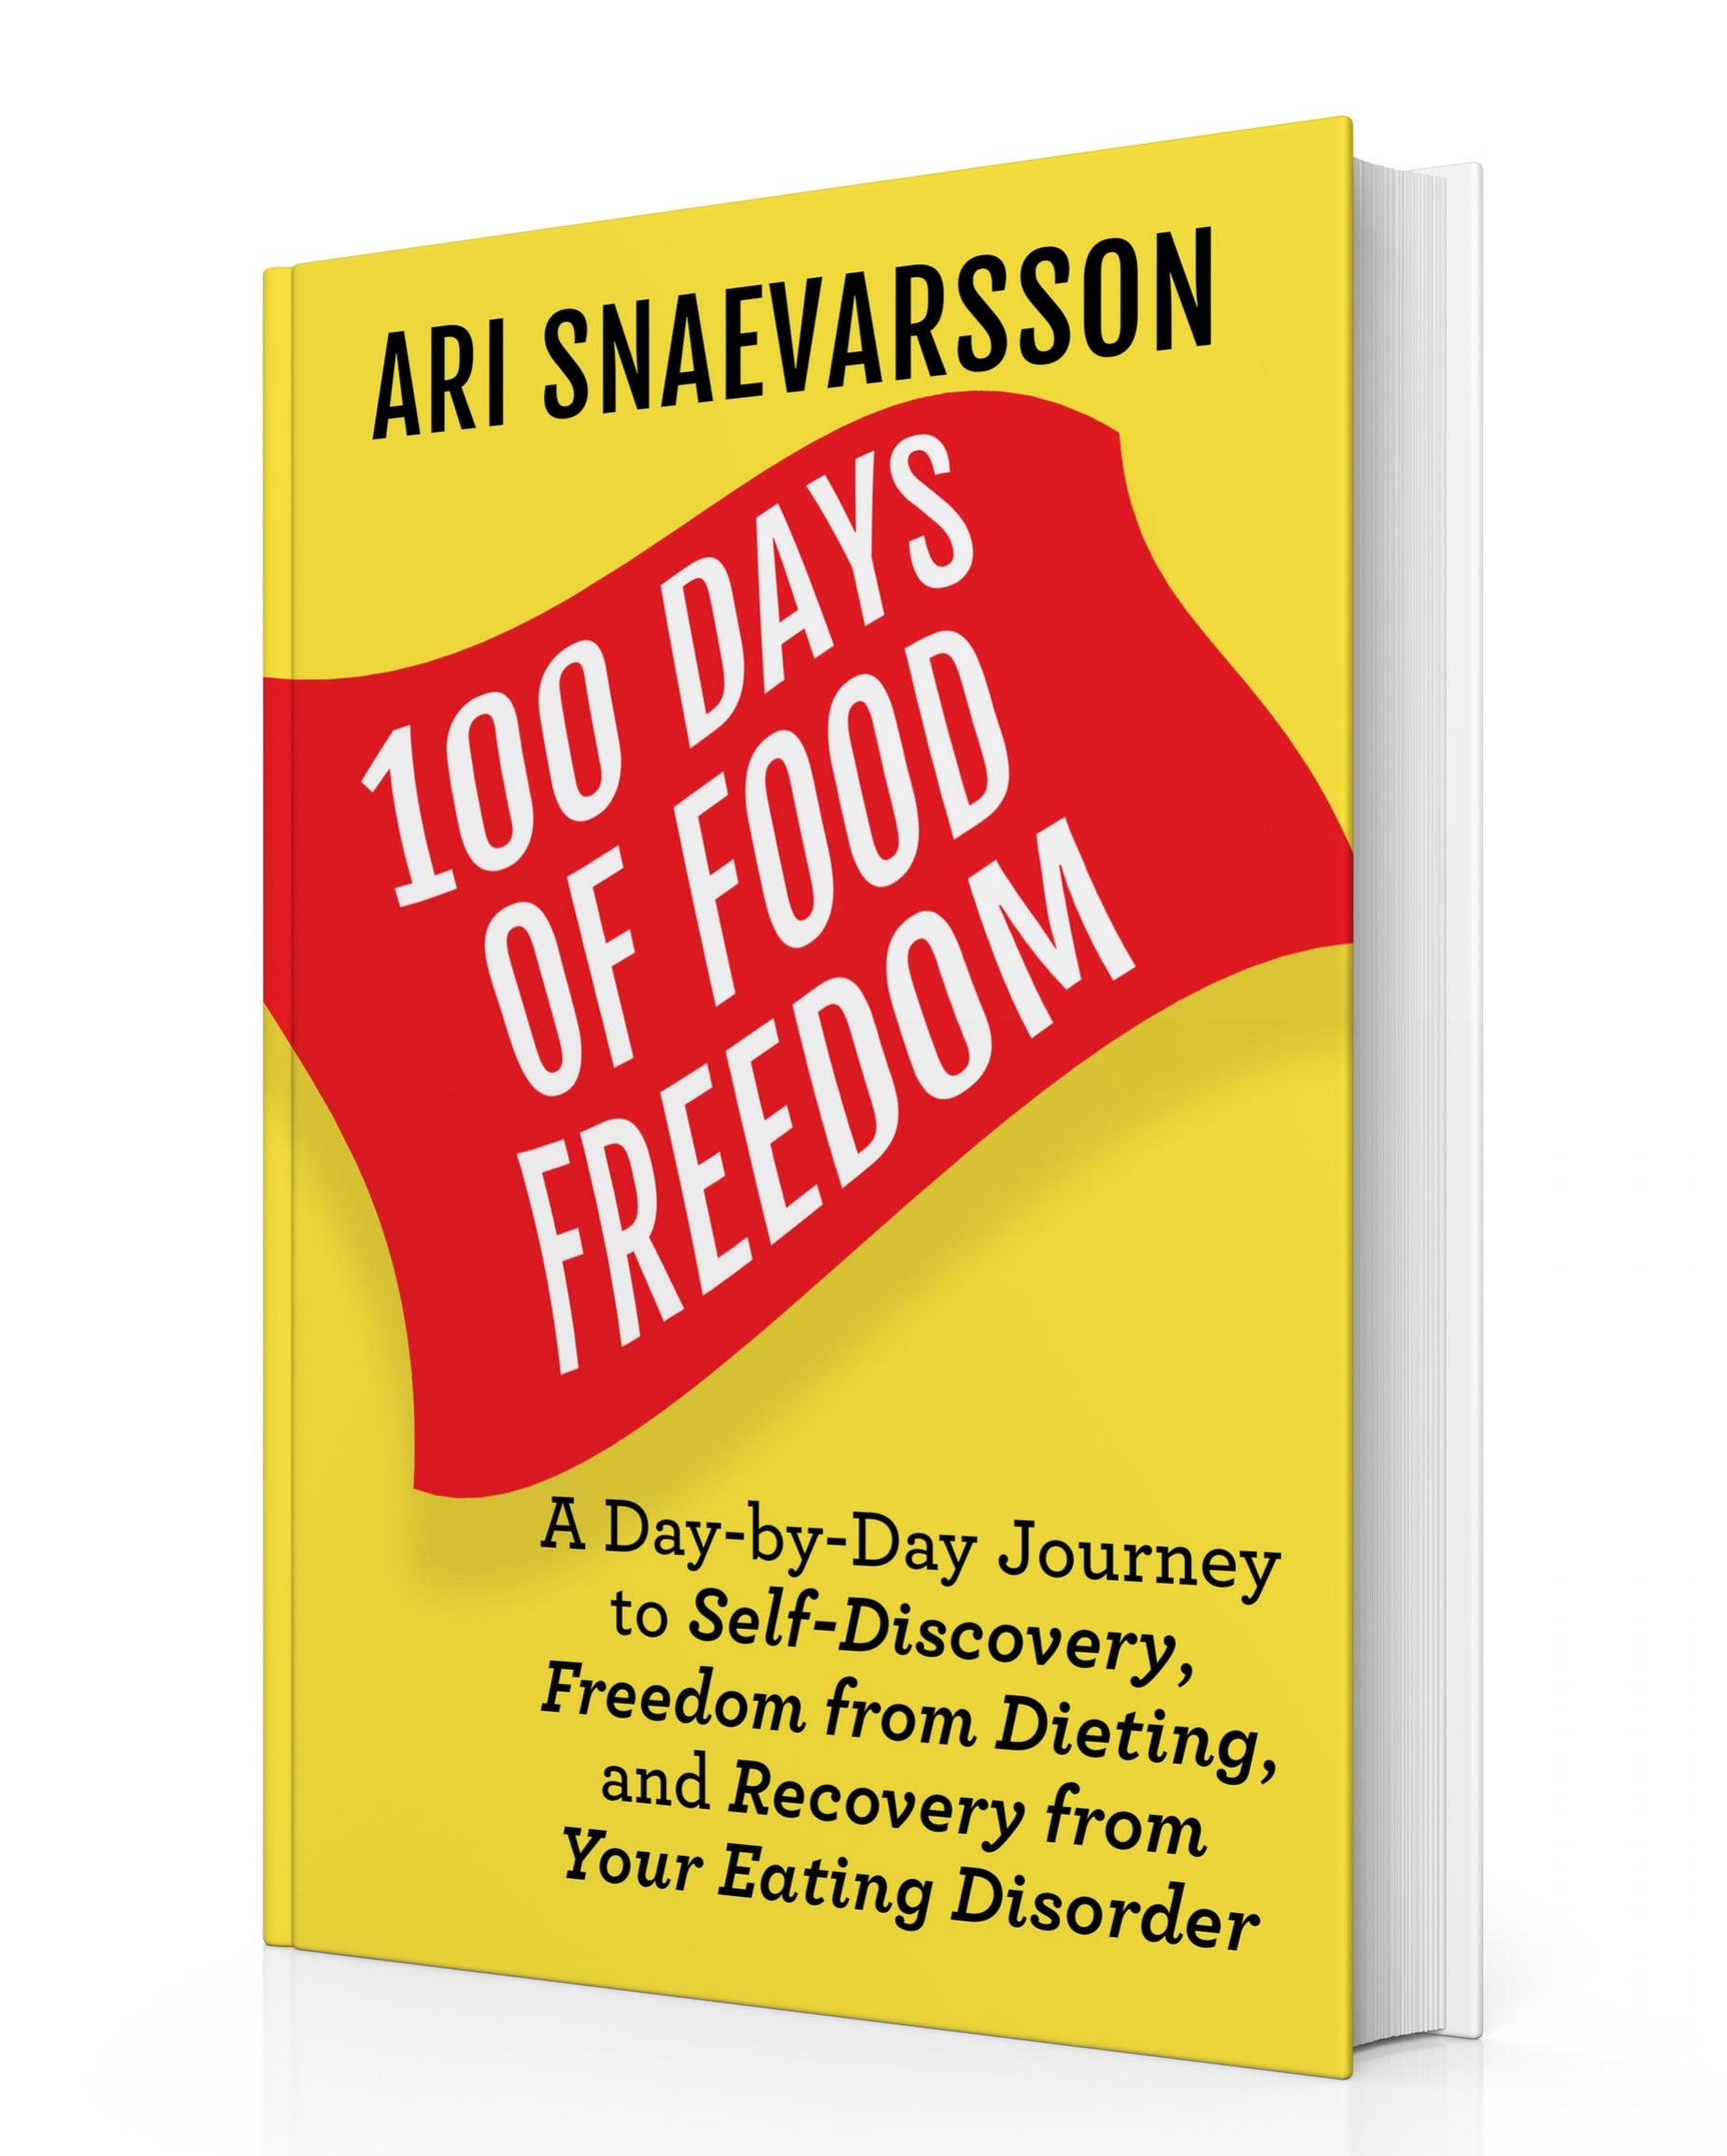 100 Days of Food Freedom Book.jpg